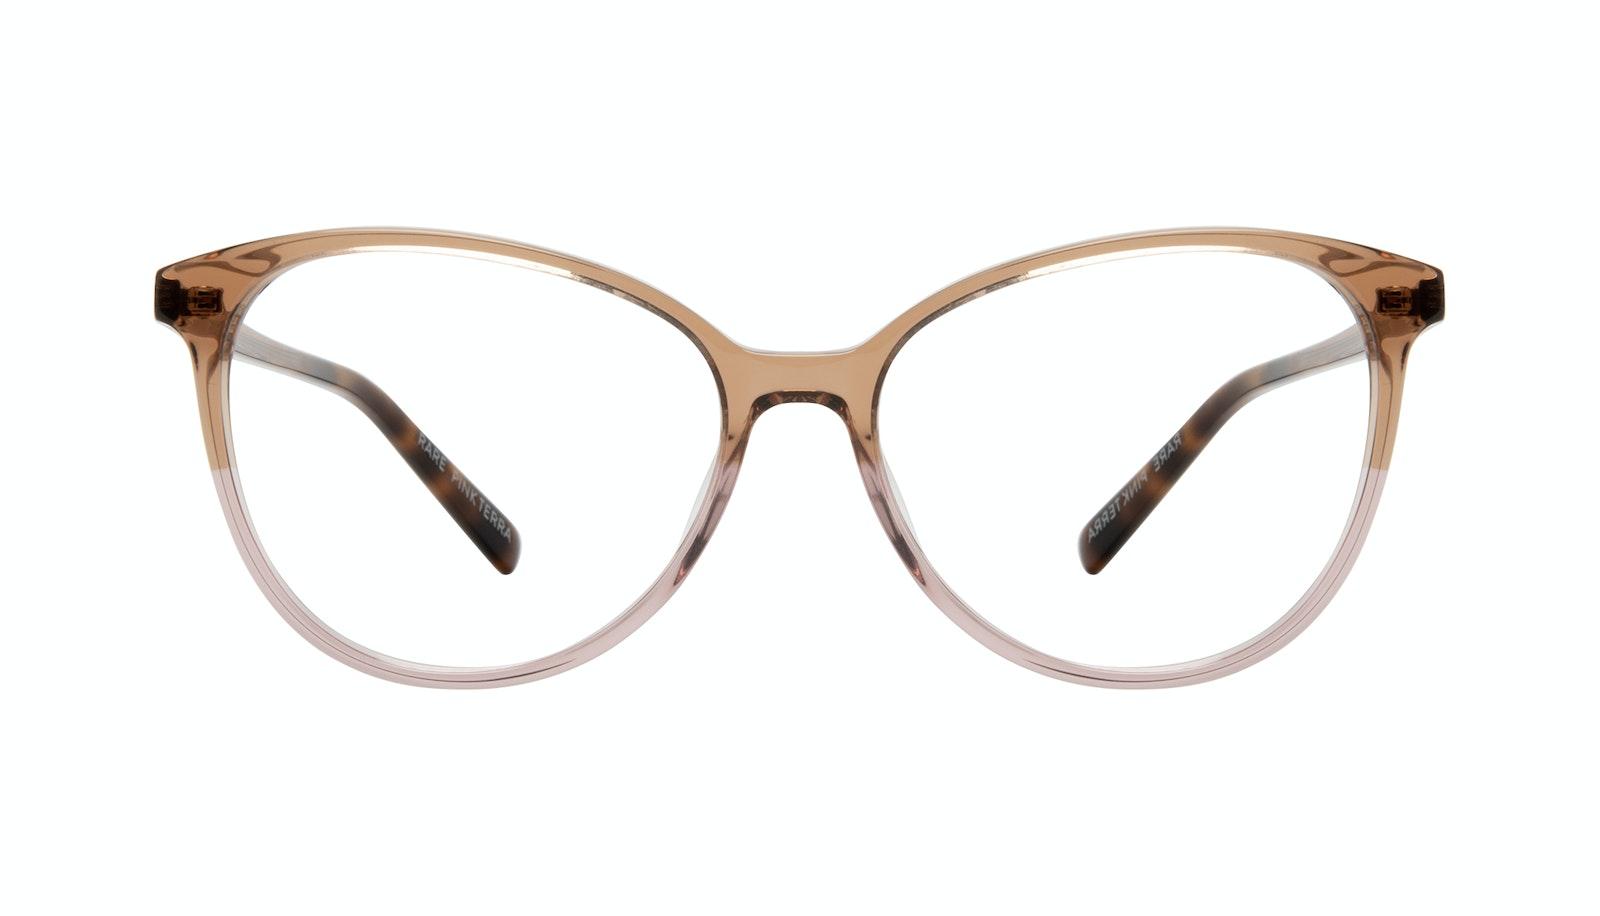 68a5592f437e Affordable Fashion Glasses Cat Eye Eyeglasses Women Rare Pink Terra